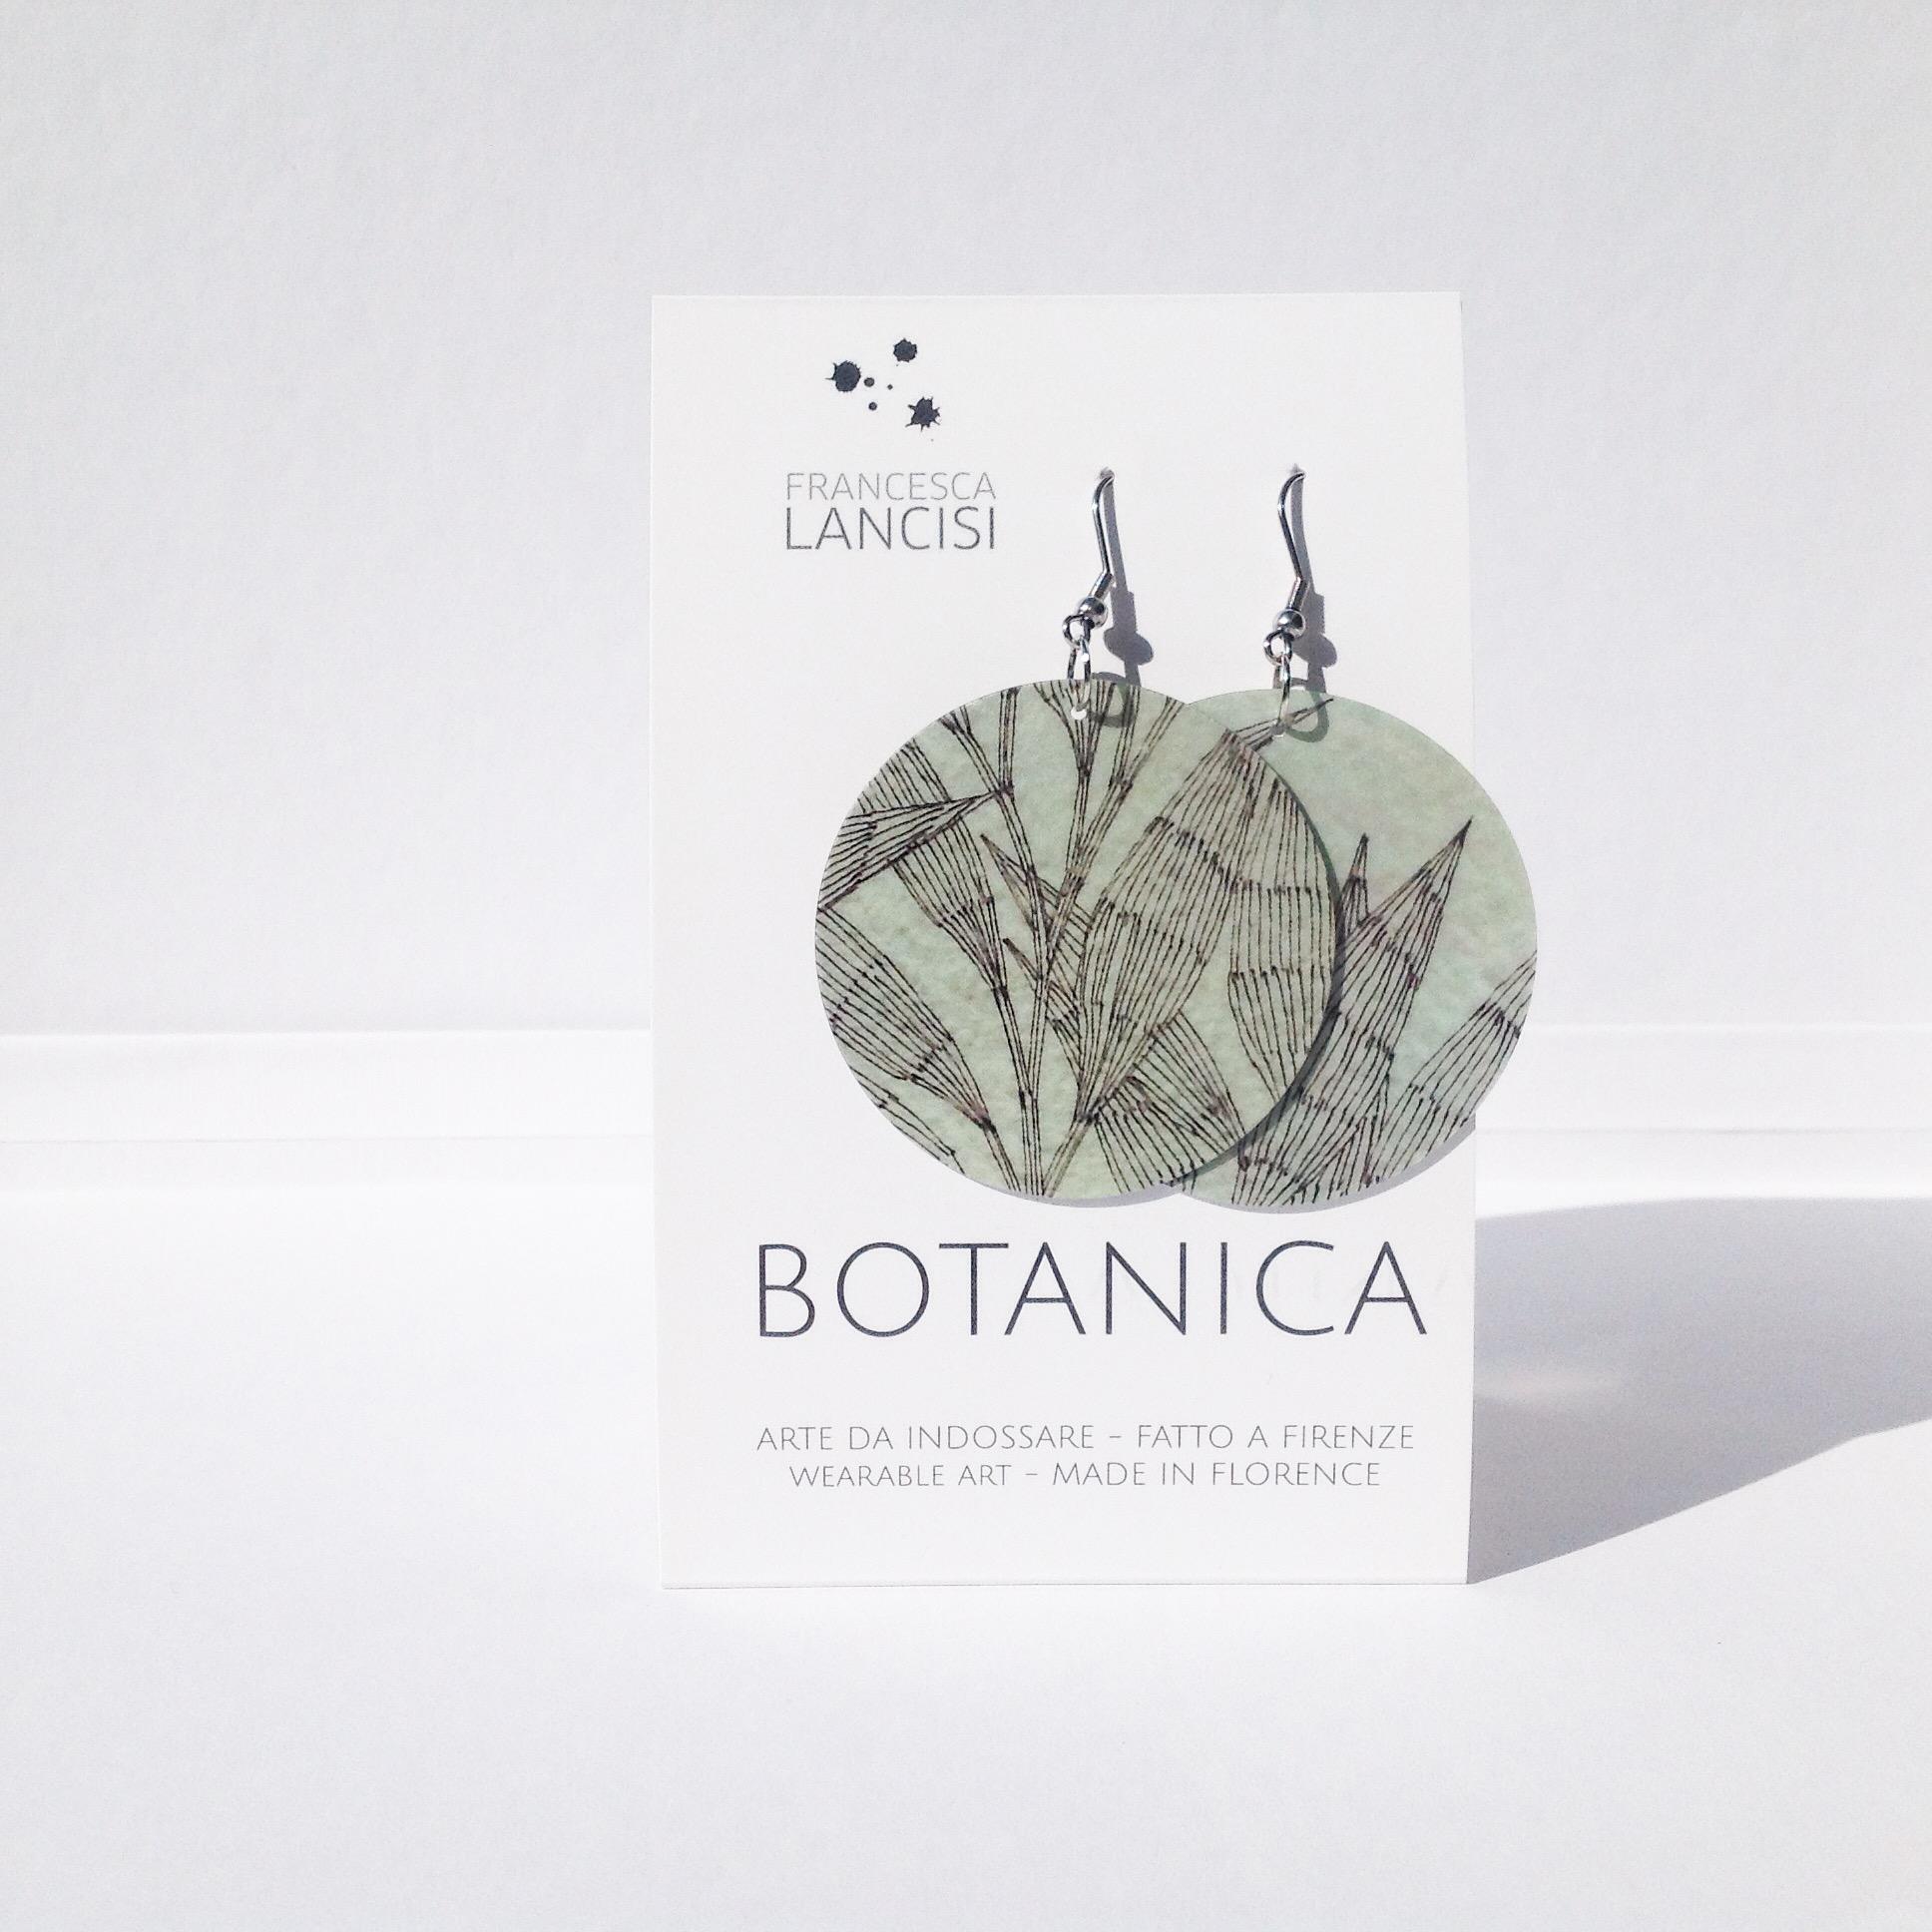 ORECCHINI BOTANICA FRANCESCA LANCISI (5).JPG